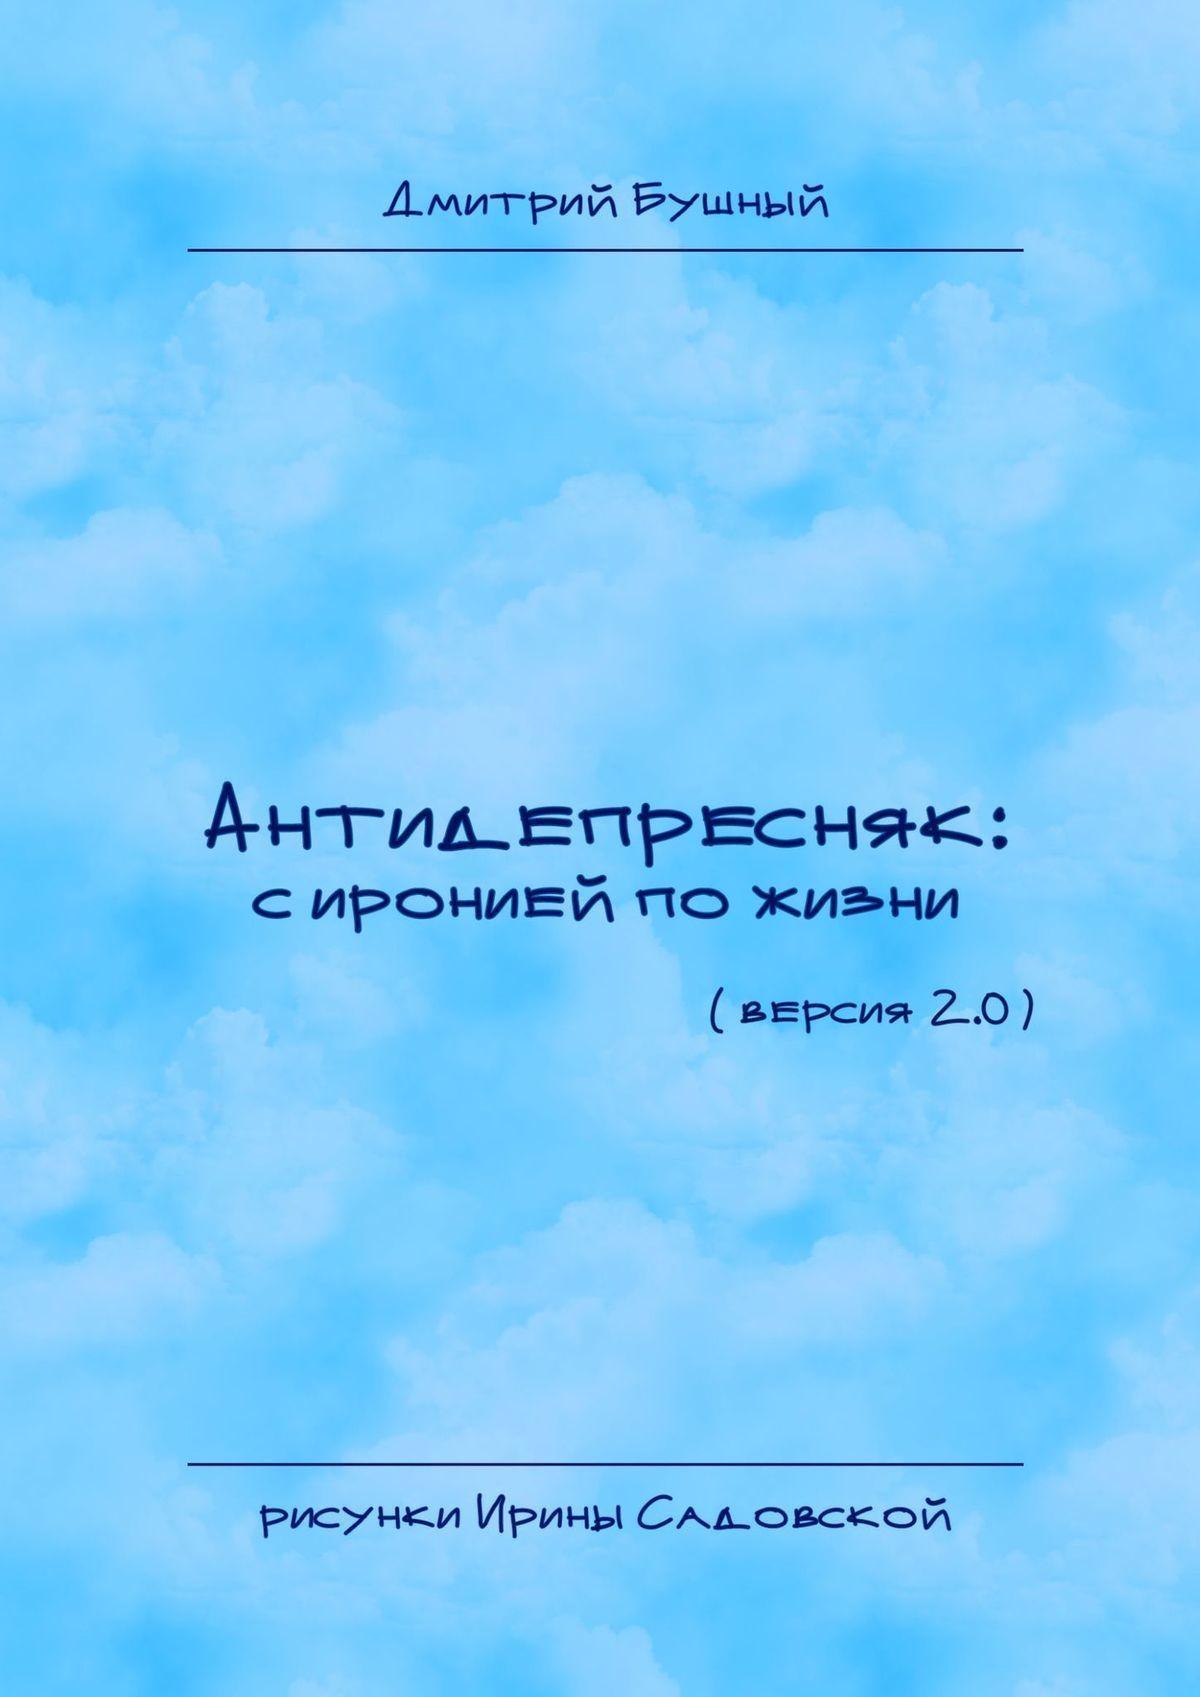 Дмитрий Бушный Антидепресняк: с иронией по жизни. (Версия 2.0) fallout 4 automatron дополнение [pc цифровая версия] цифровая версия